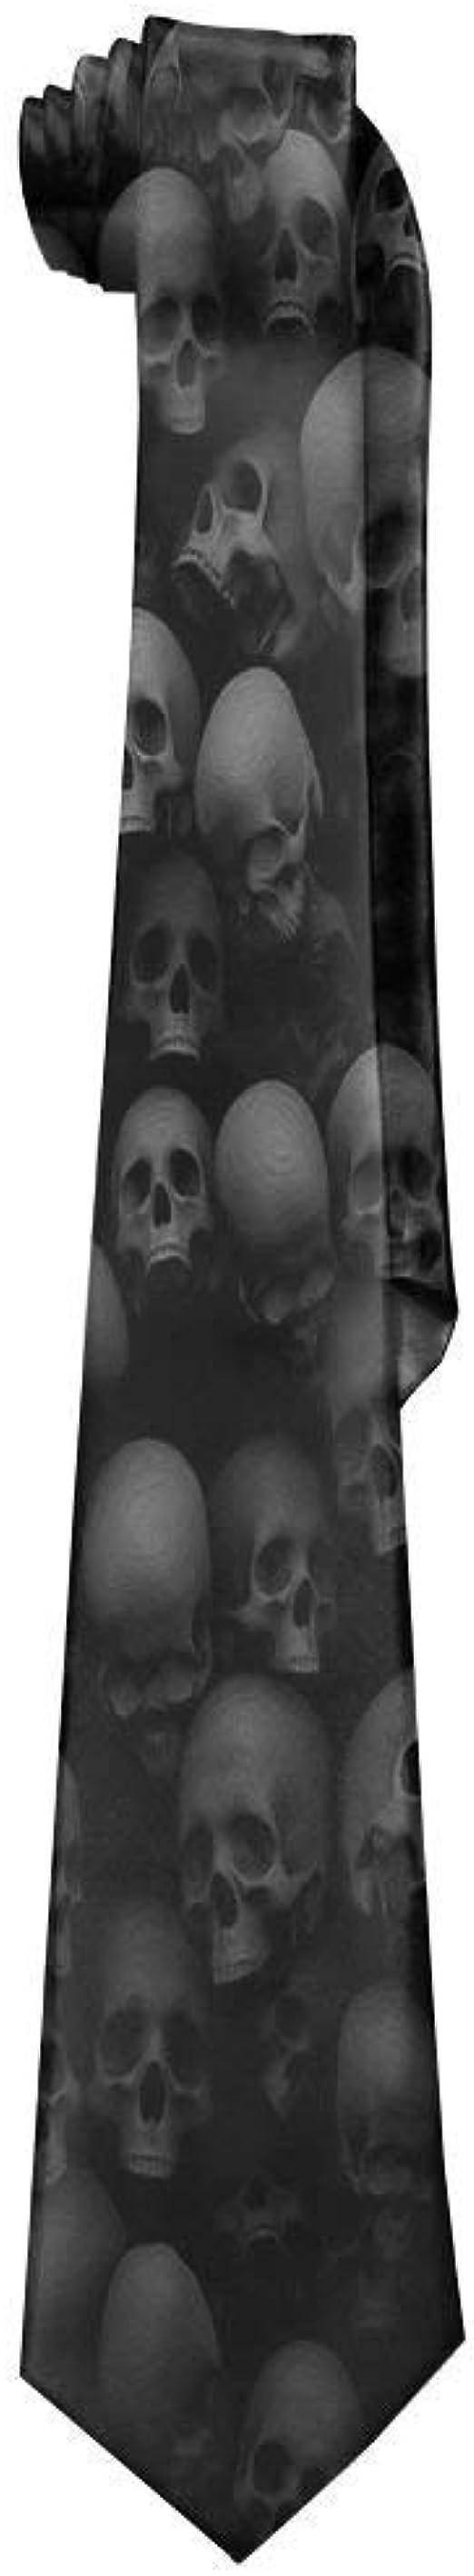 Acheter cravate tete de mort online 4